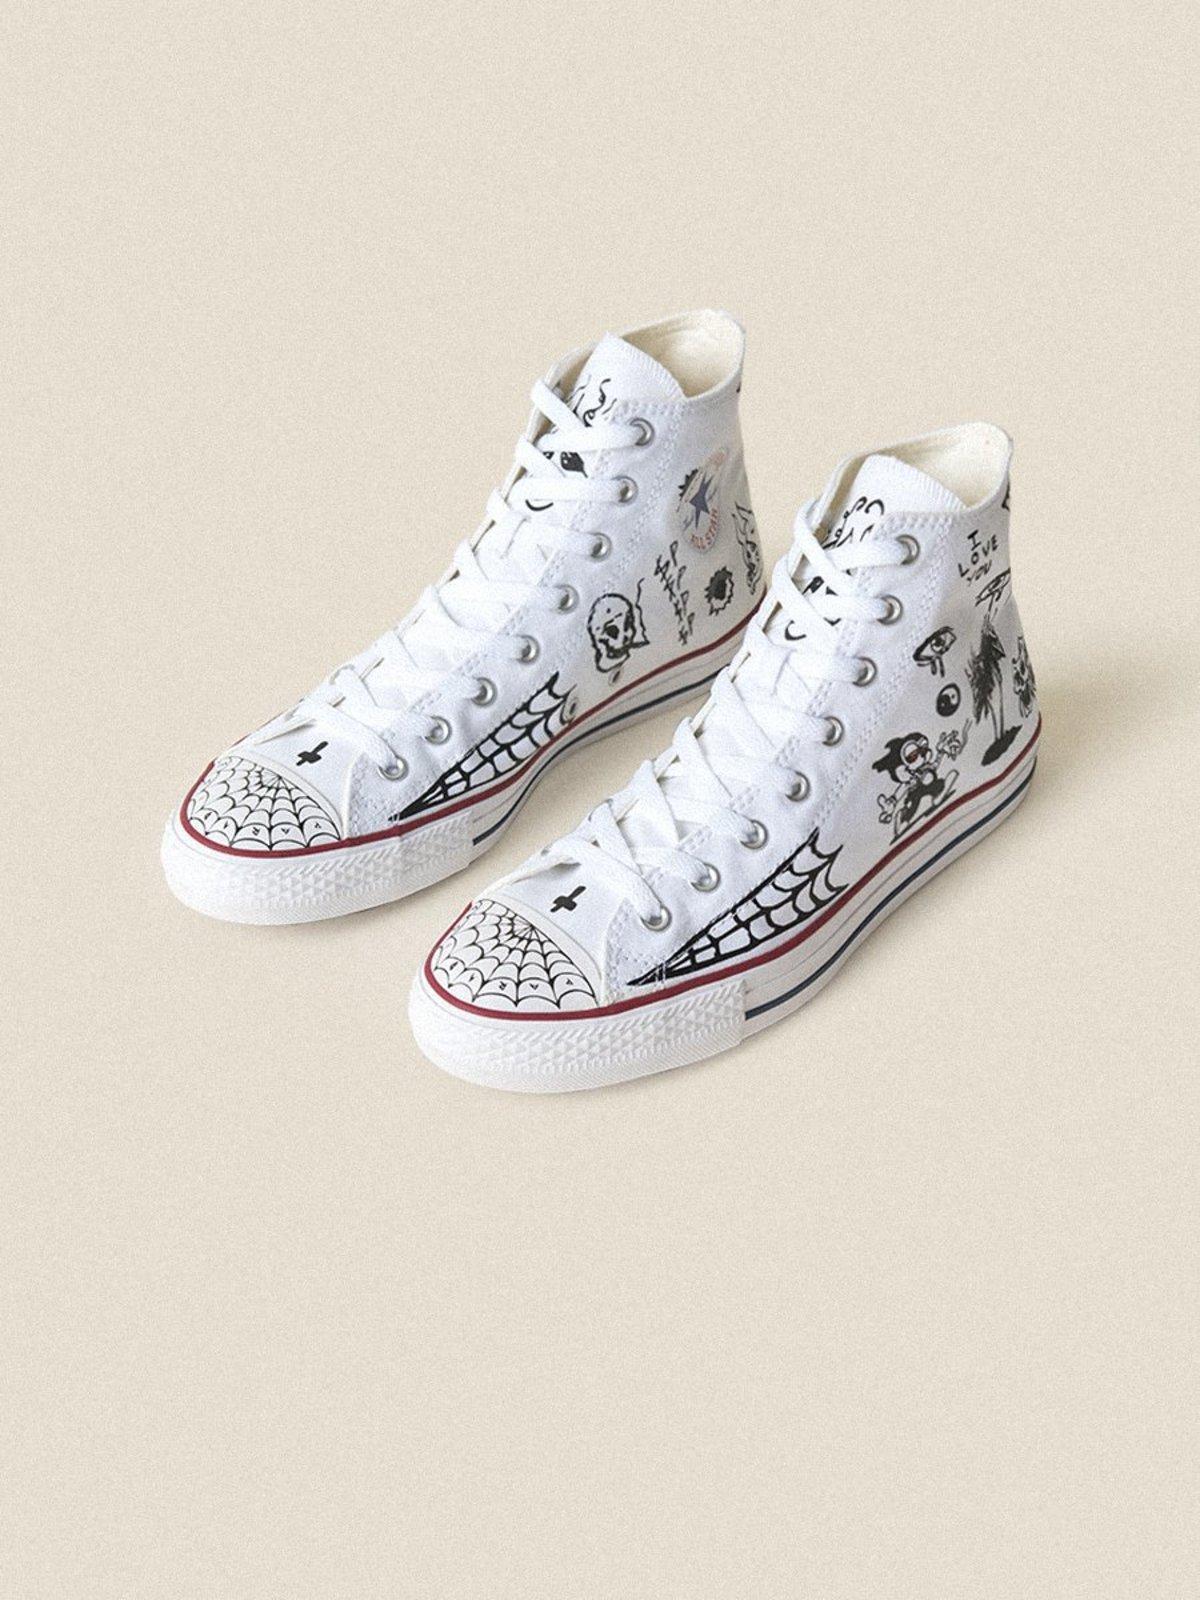 Converse Sean Pablo CTAS Pro Hi Sneakers - White Black White ... 277be193c